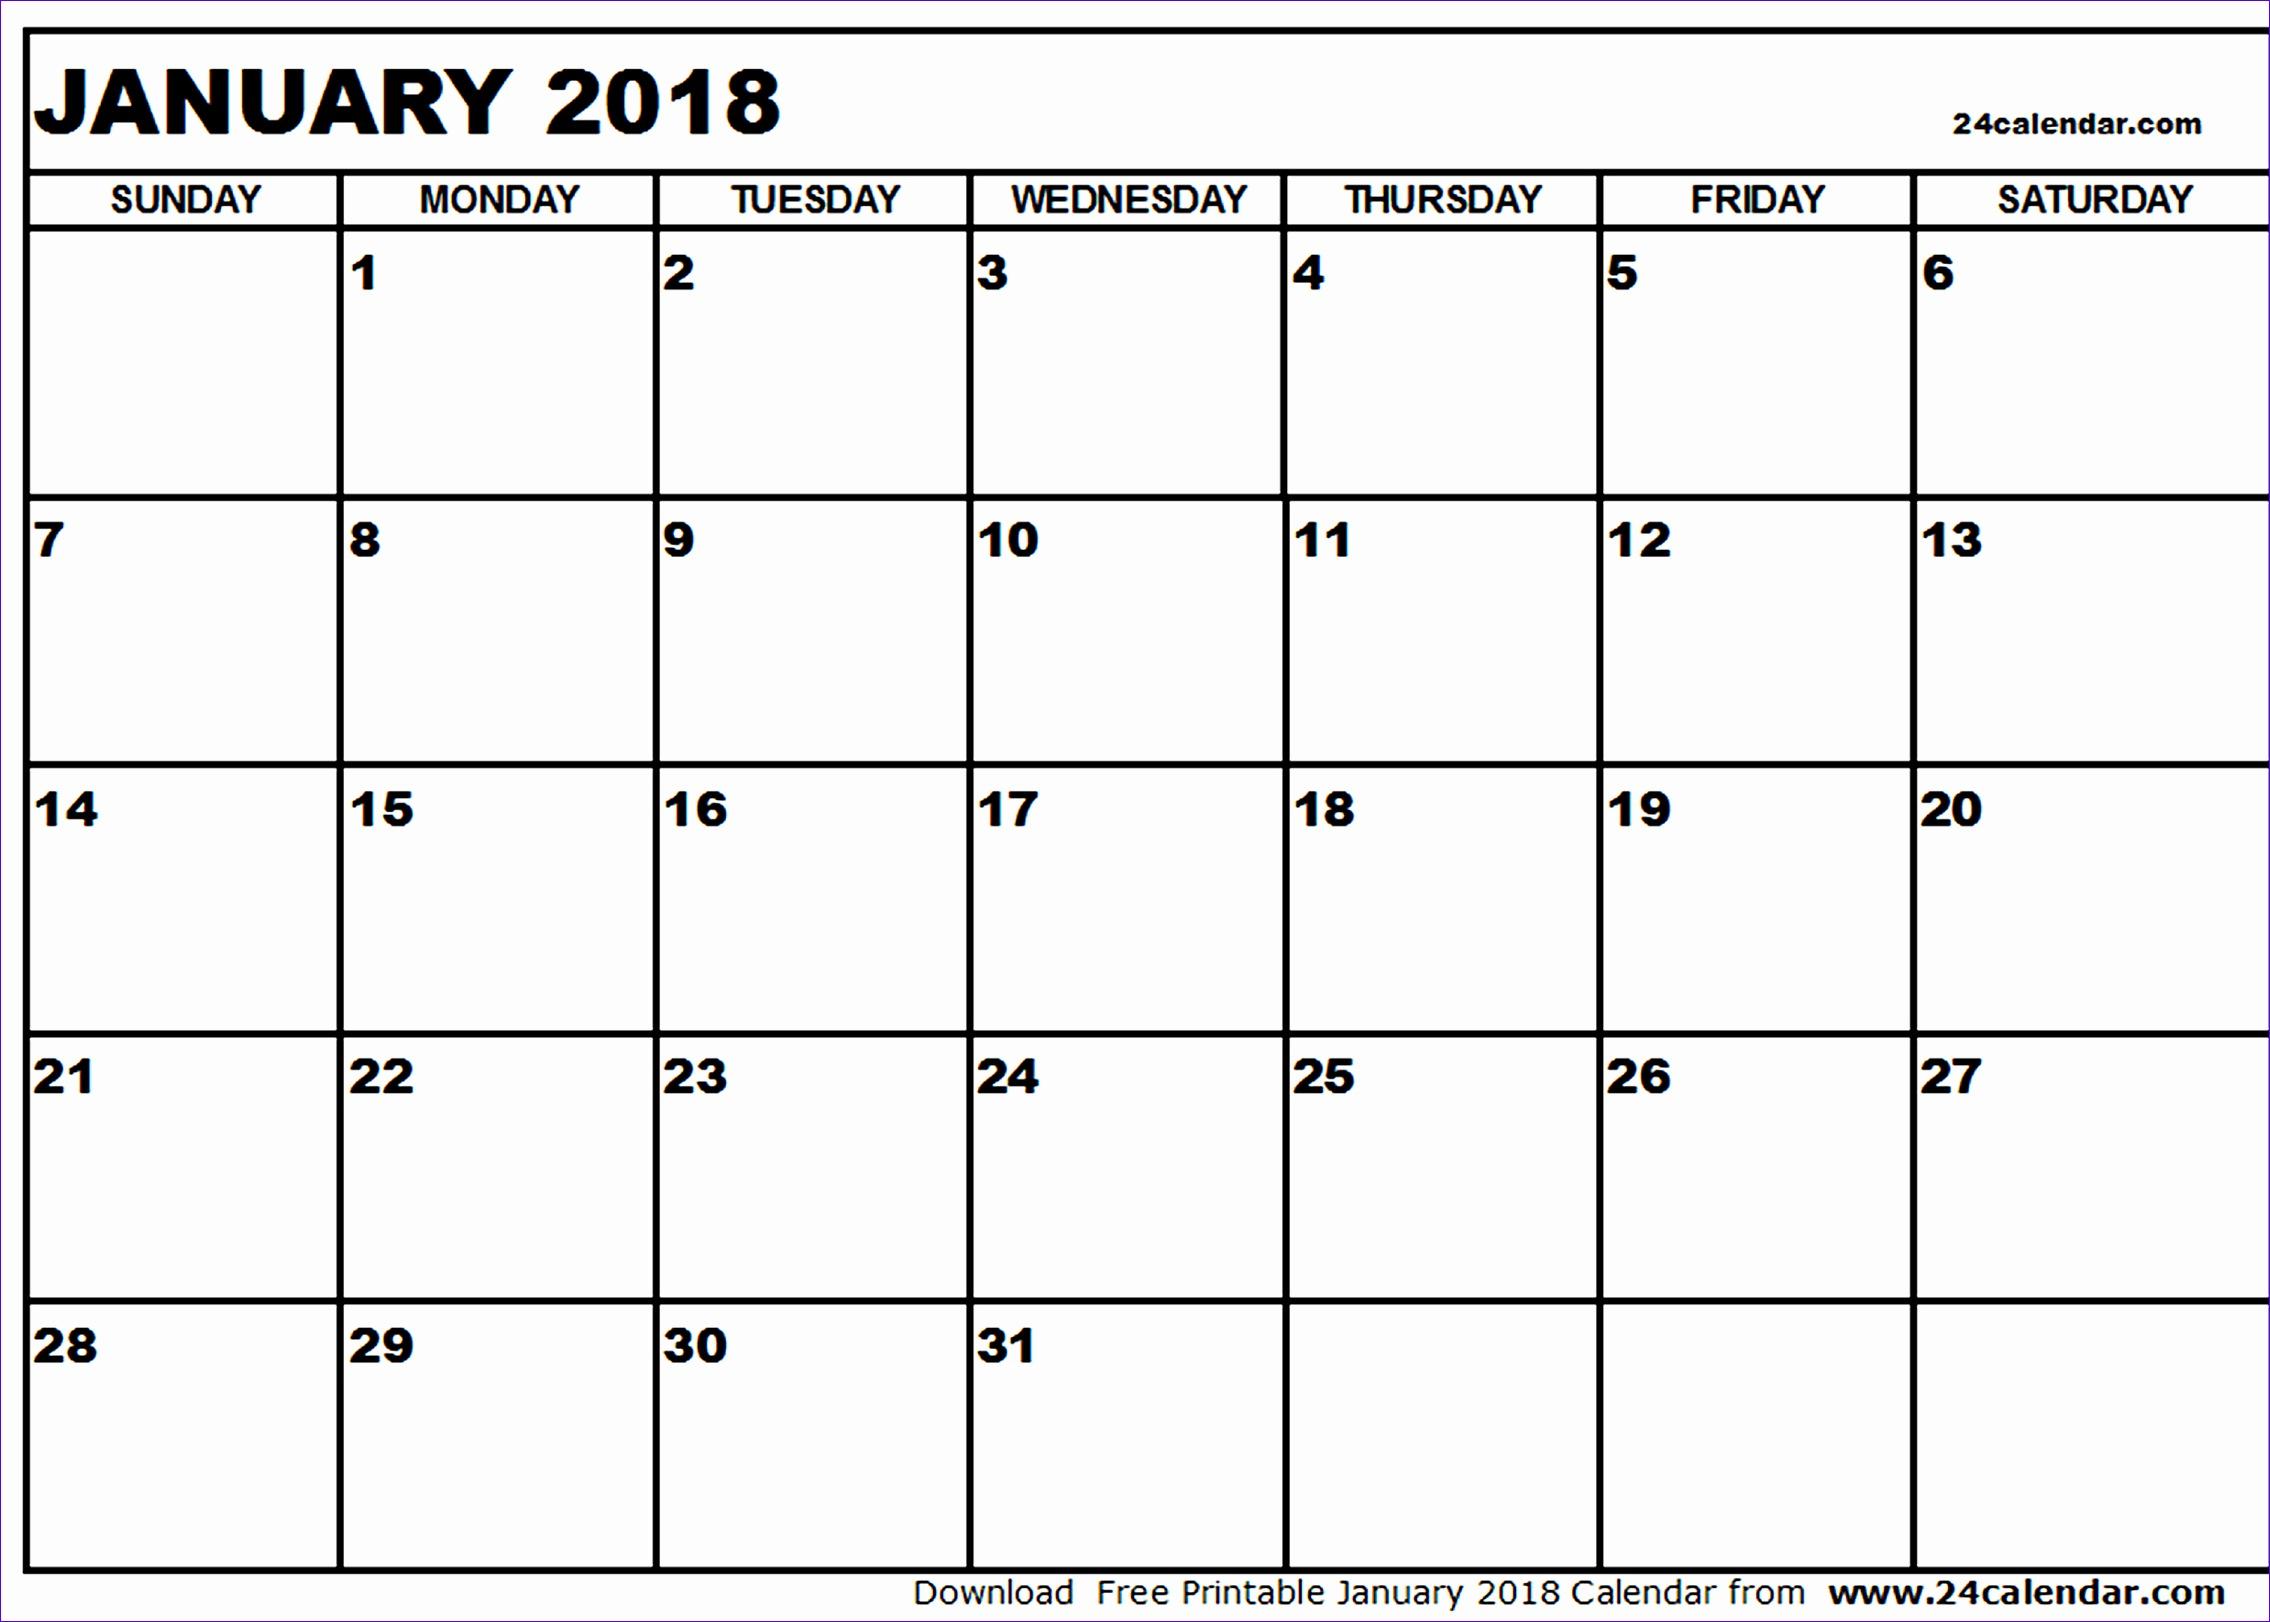 january 2018 calendar template 1298